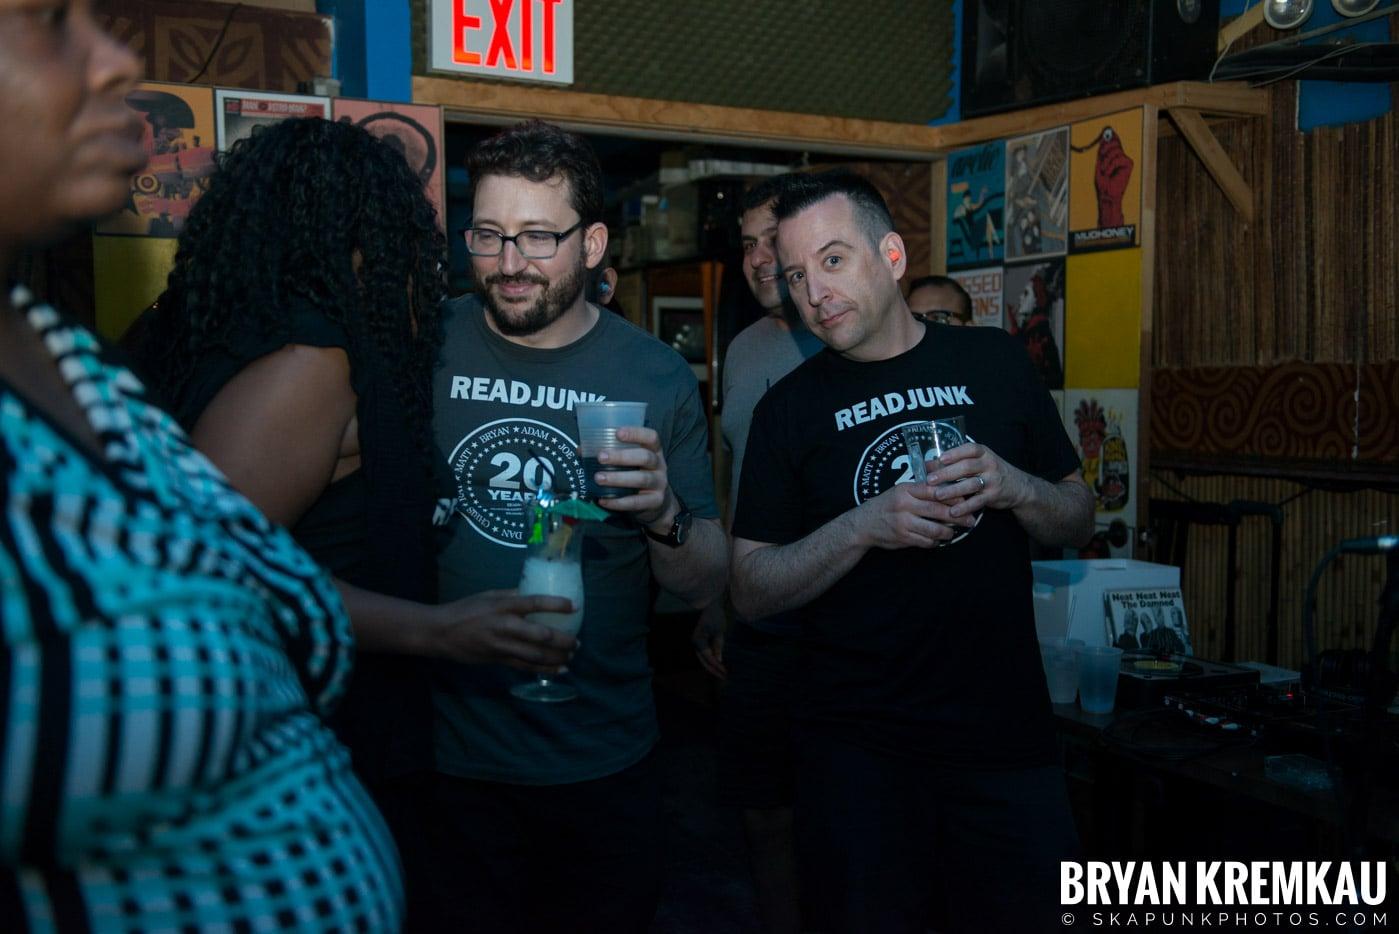 ReadJunk.com 20th Anniversary Party @ Otto's Shrunken Head, NYC - 4.29.17 (40)